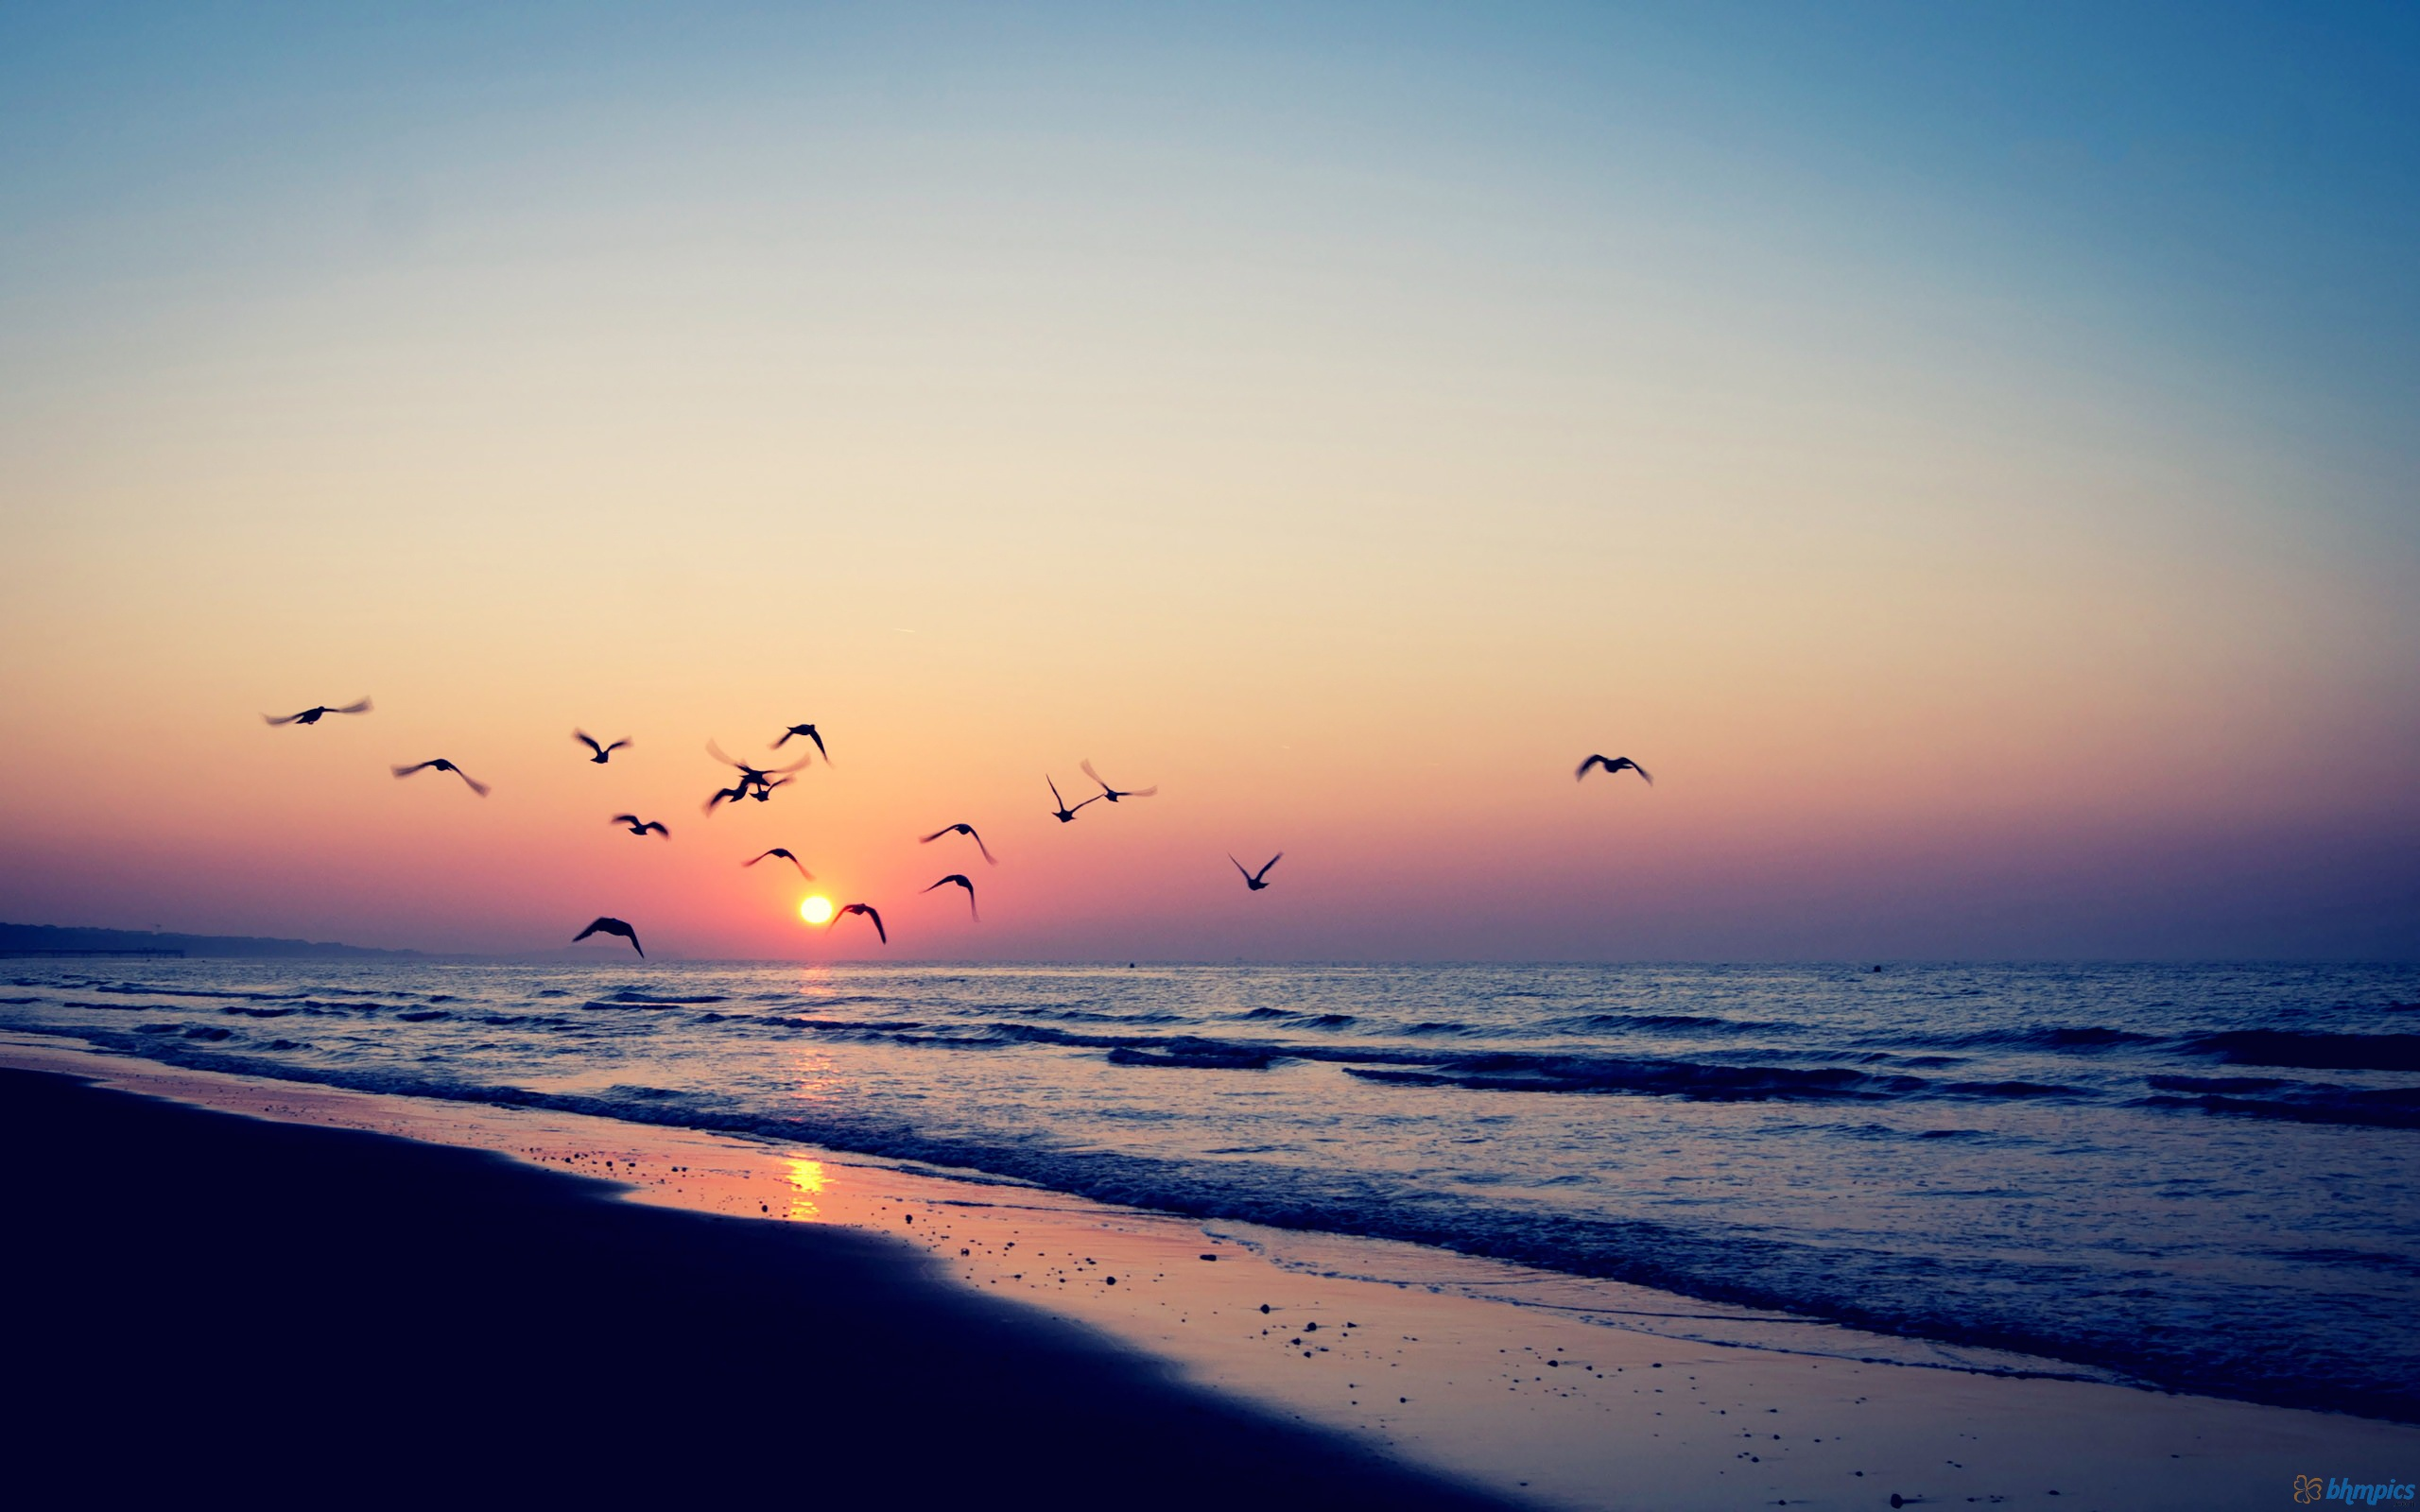 592875-birds-flying-at-sunset